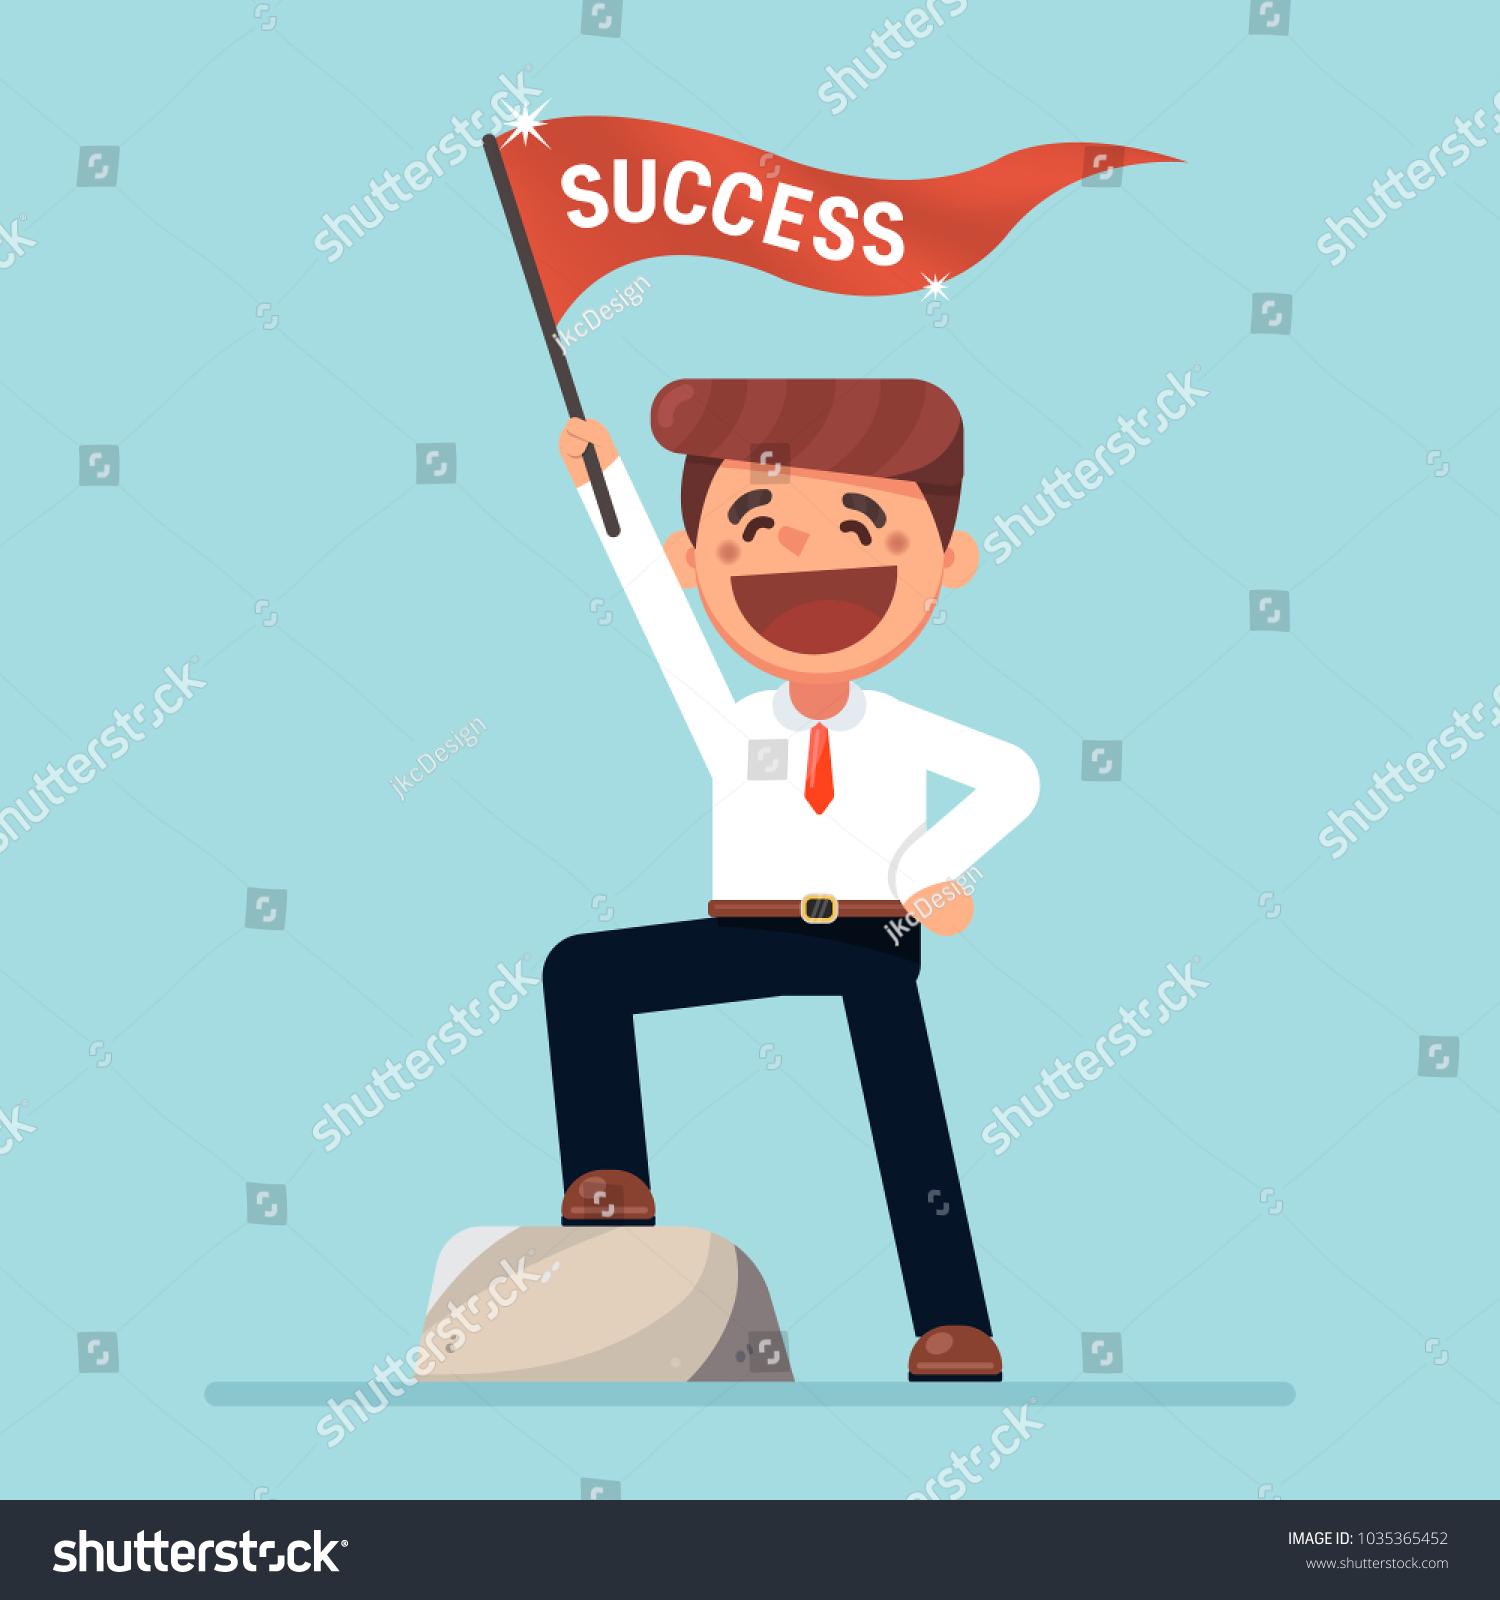 businessman smile waving flag success cartoon stock vector royalty free 1035365452 https www shutterstock com image vector businessman smile waving flag success cartoon 1035365452